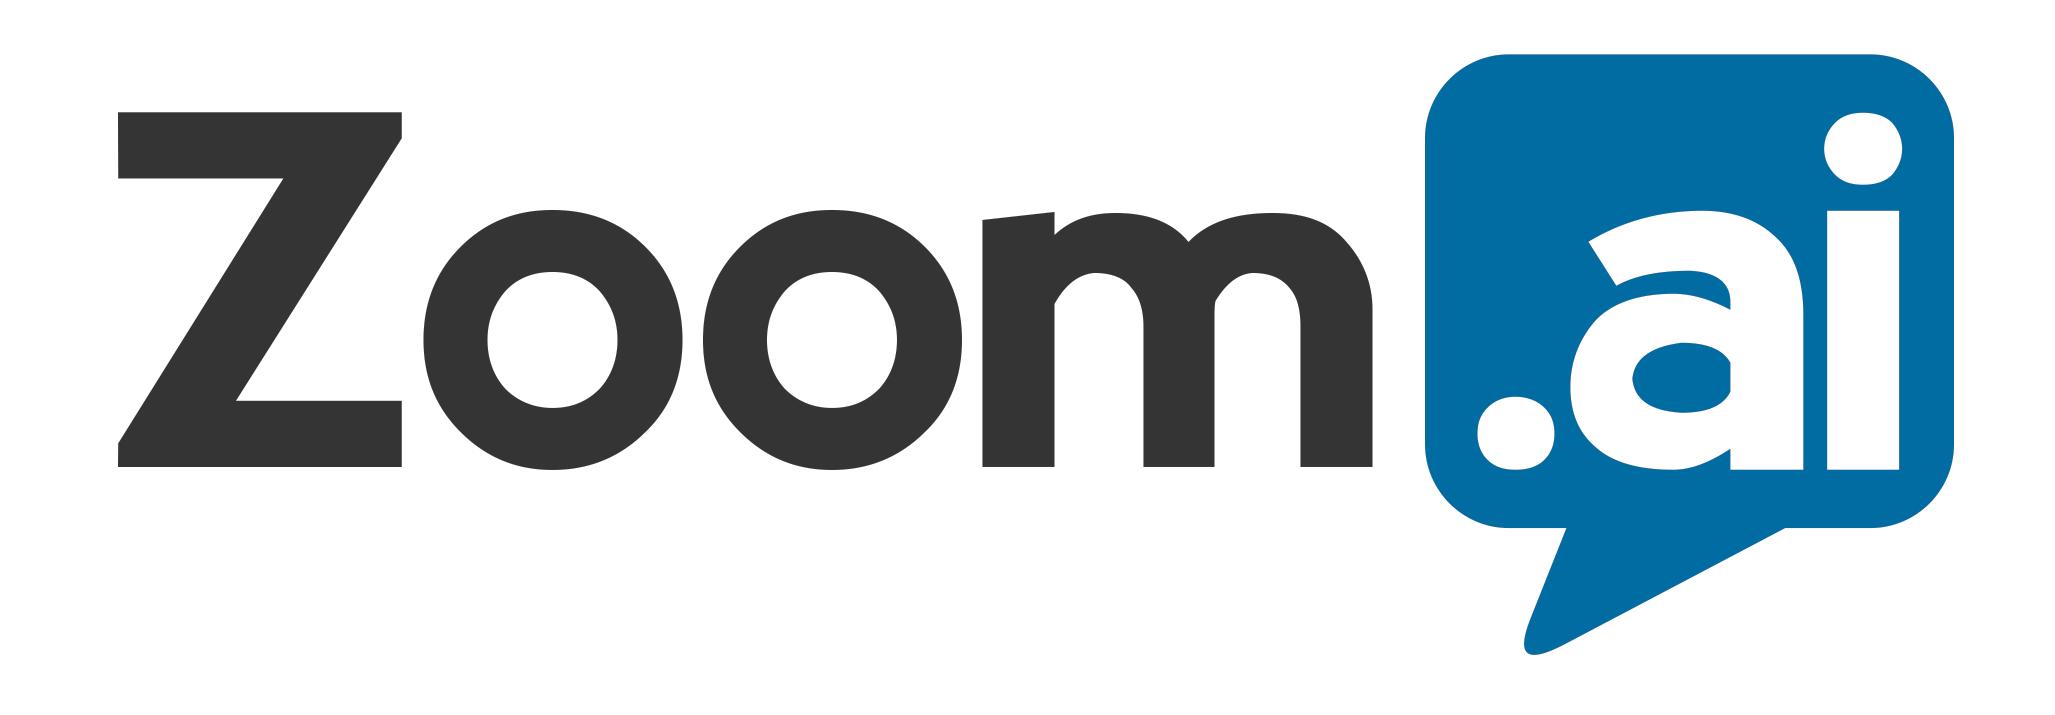 zoom-aicmyk_1